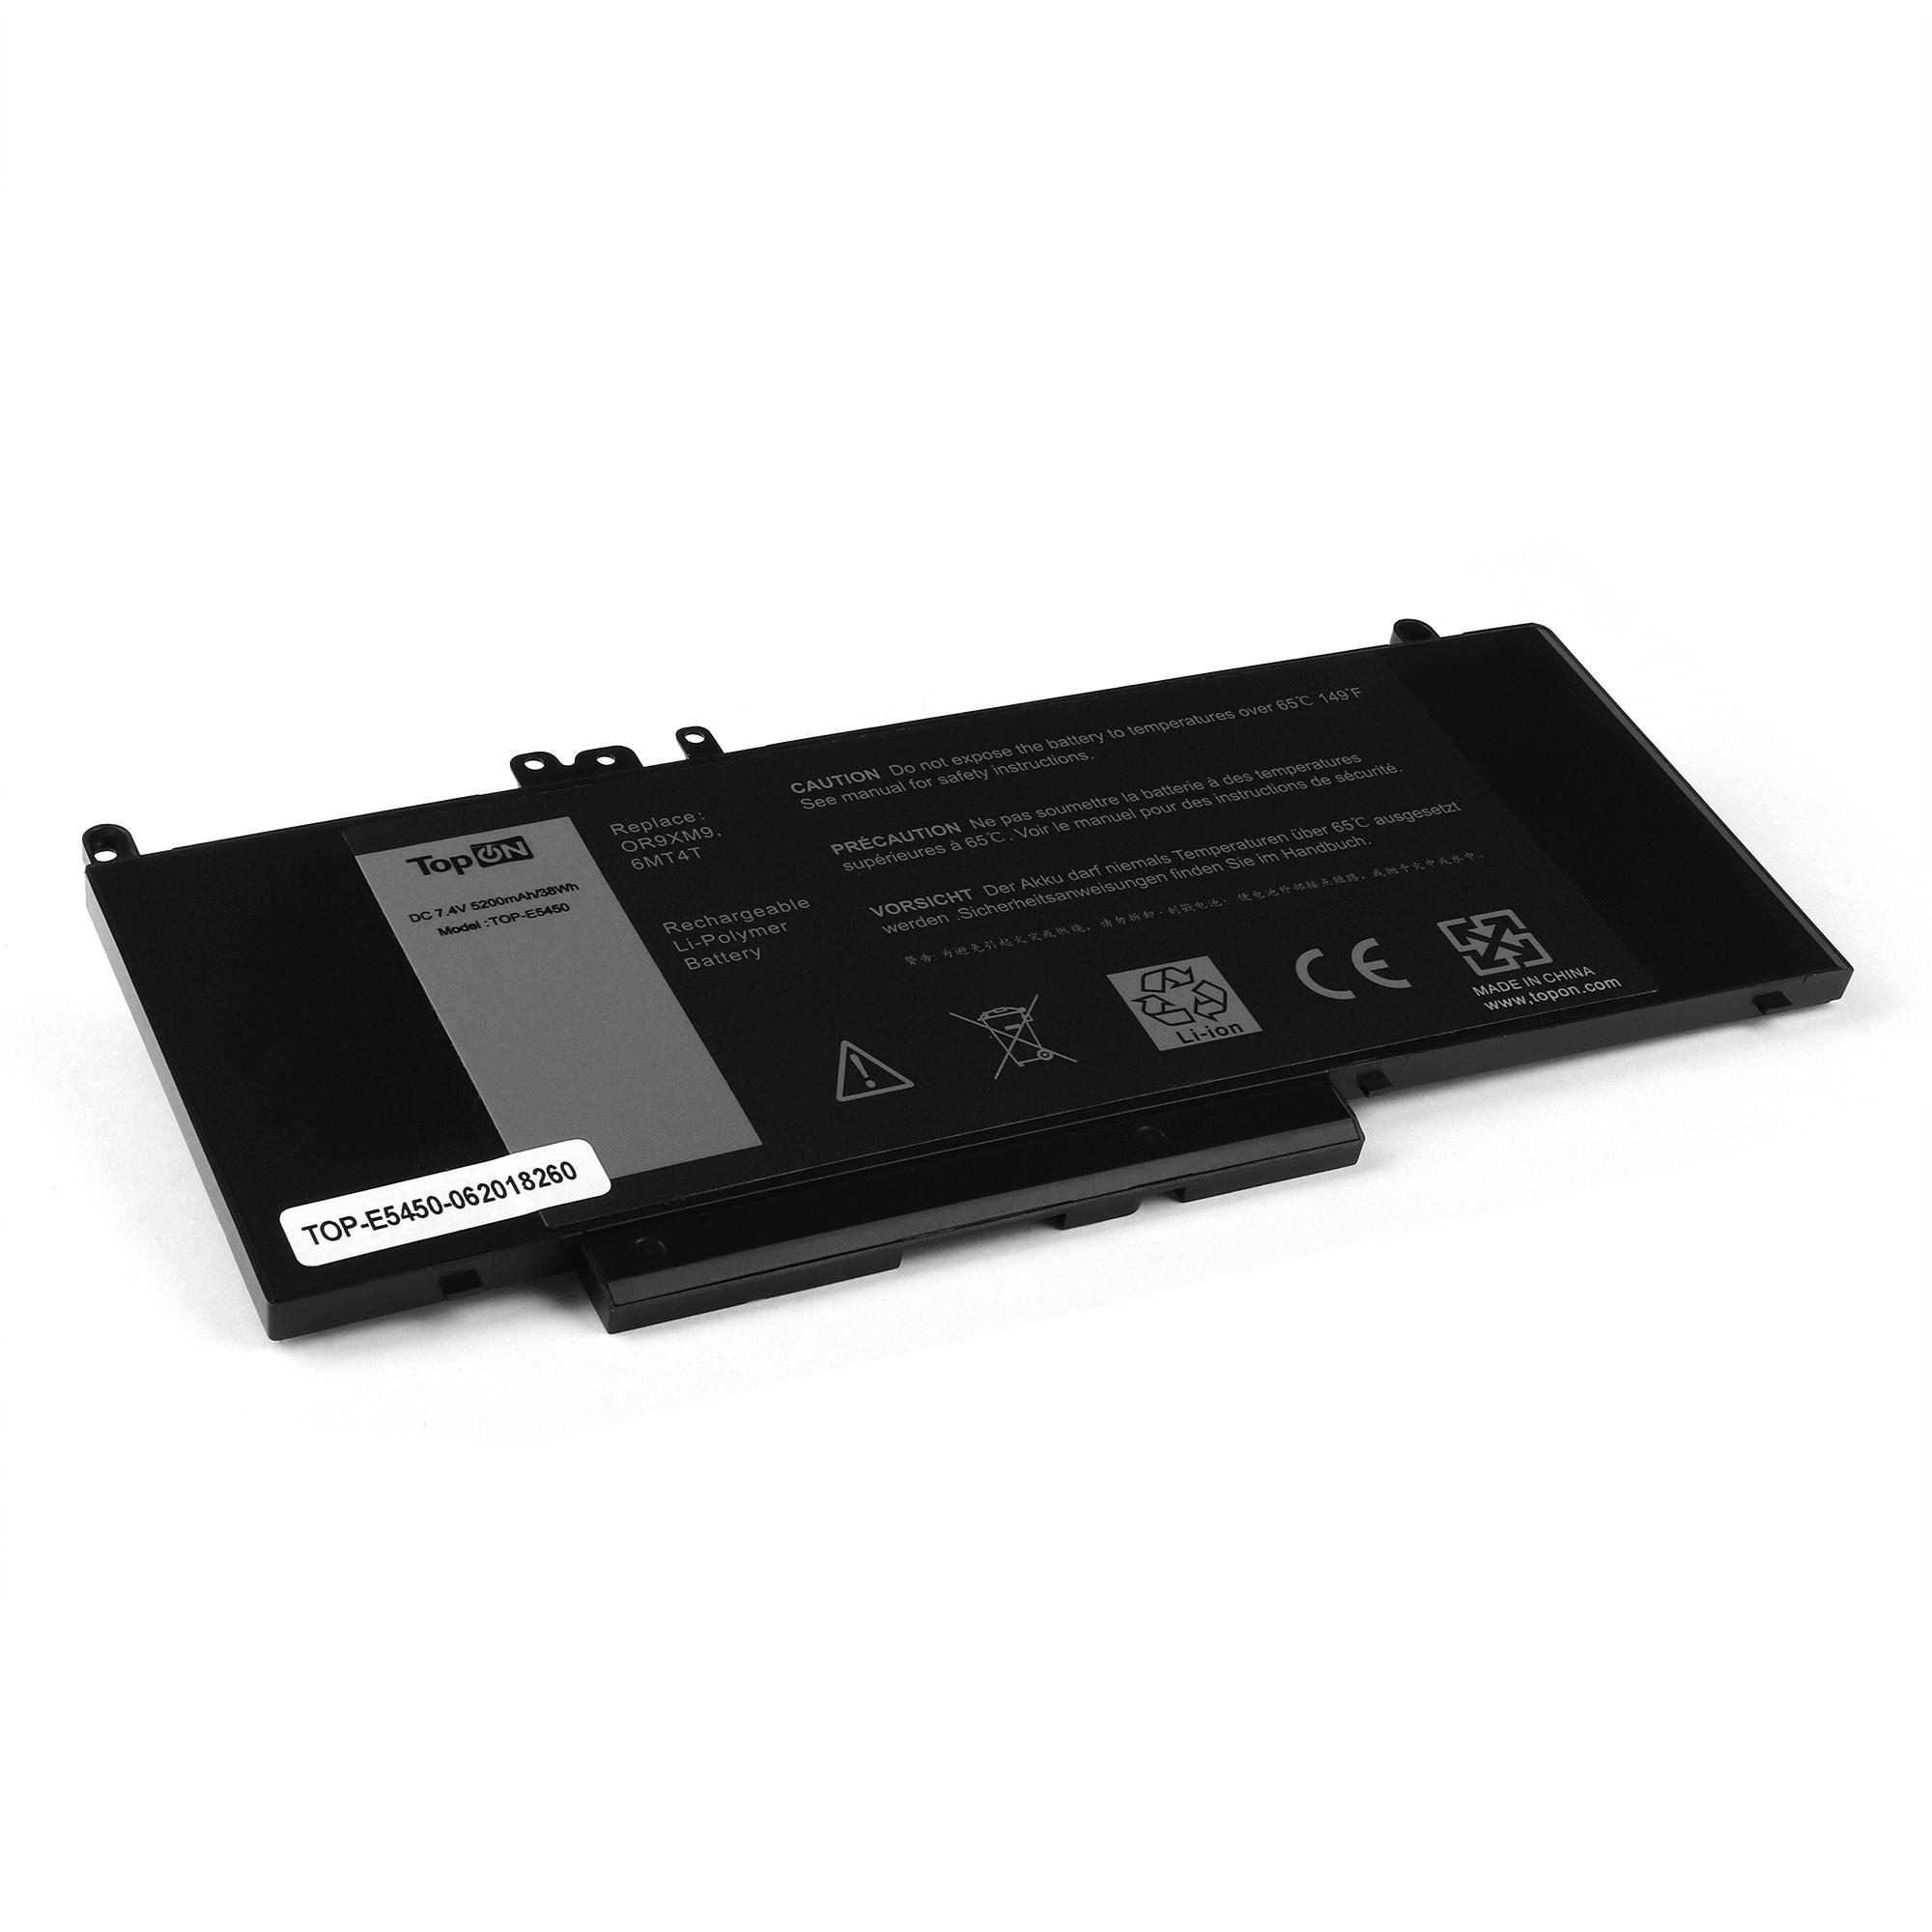 Аккумулятор для ноутбука TopON Dell Latitude E5450, E5550, 14 5000, 15 5000. 7.4V 5200mAh 38Wh. PN: 0R9XM9, 6MT4T, G5M10, 8V5GX, 08V5GX., TOP-E5450